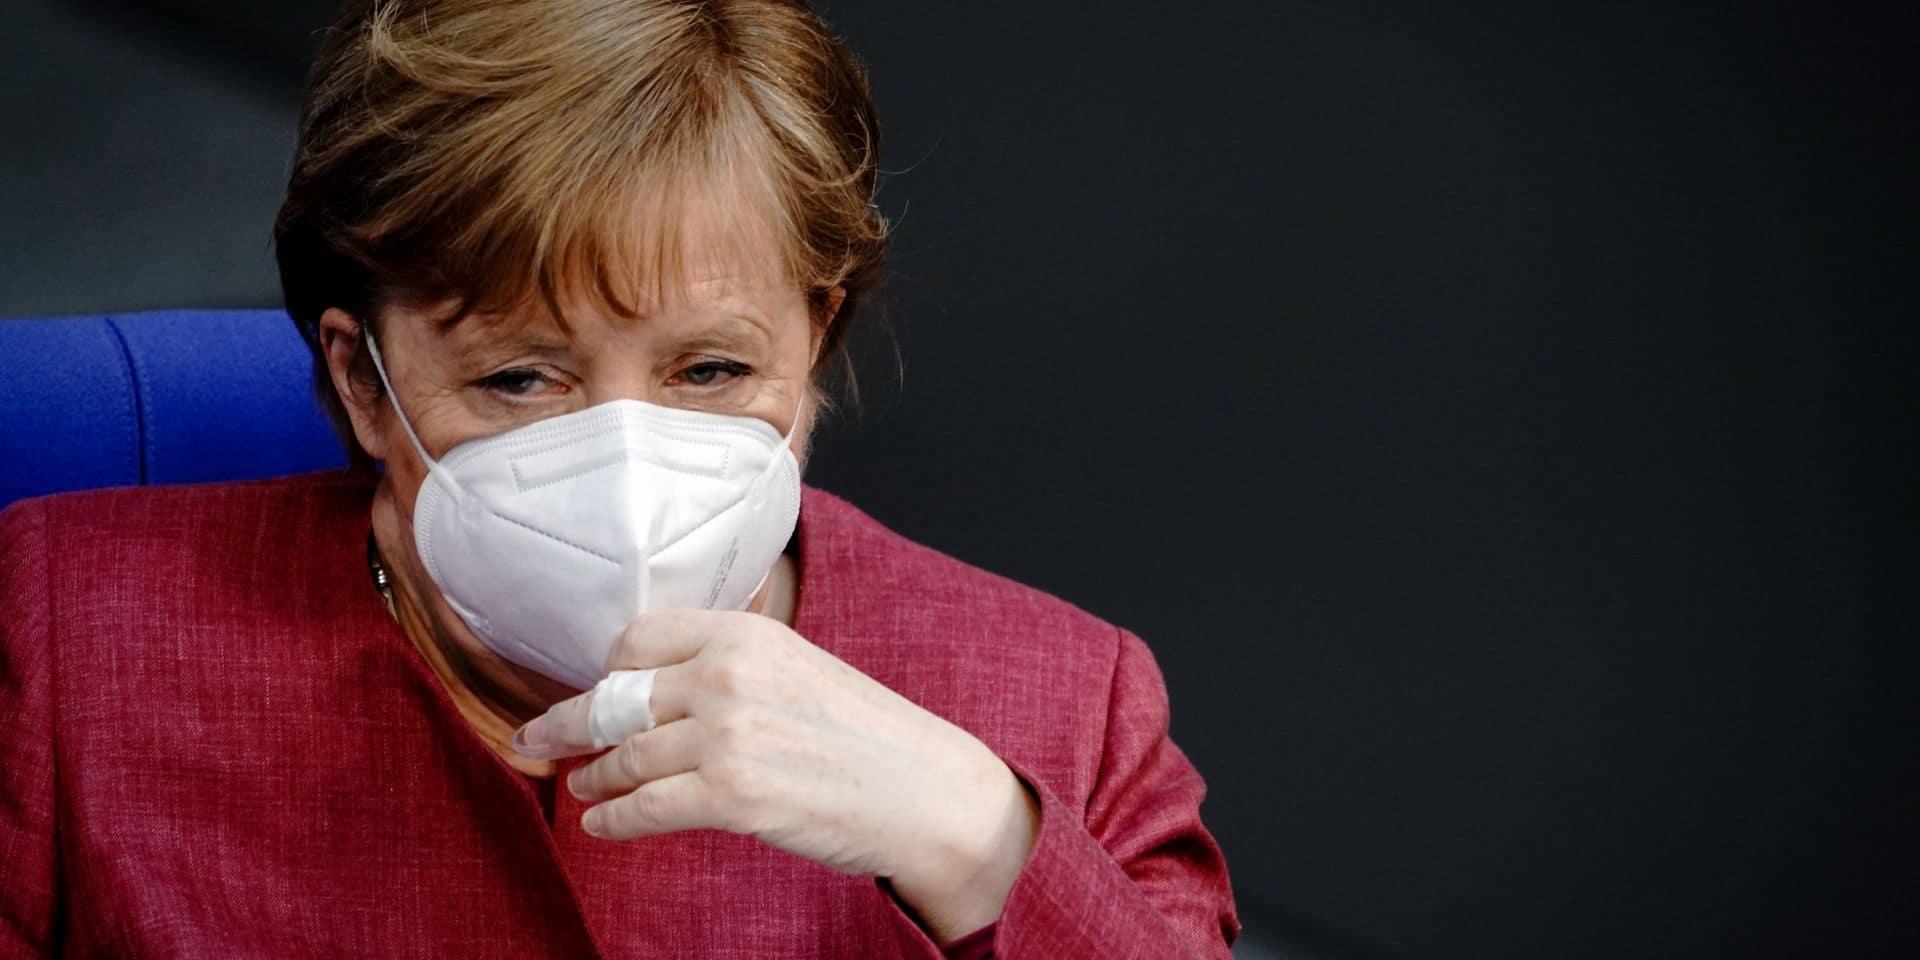 Angela Merkel a reçu une première dose de vaccin AstraZeneca